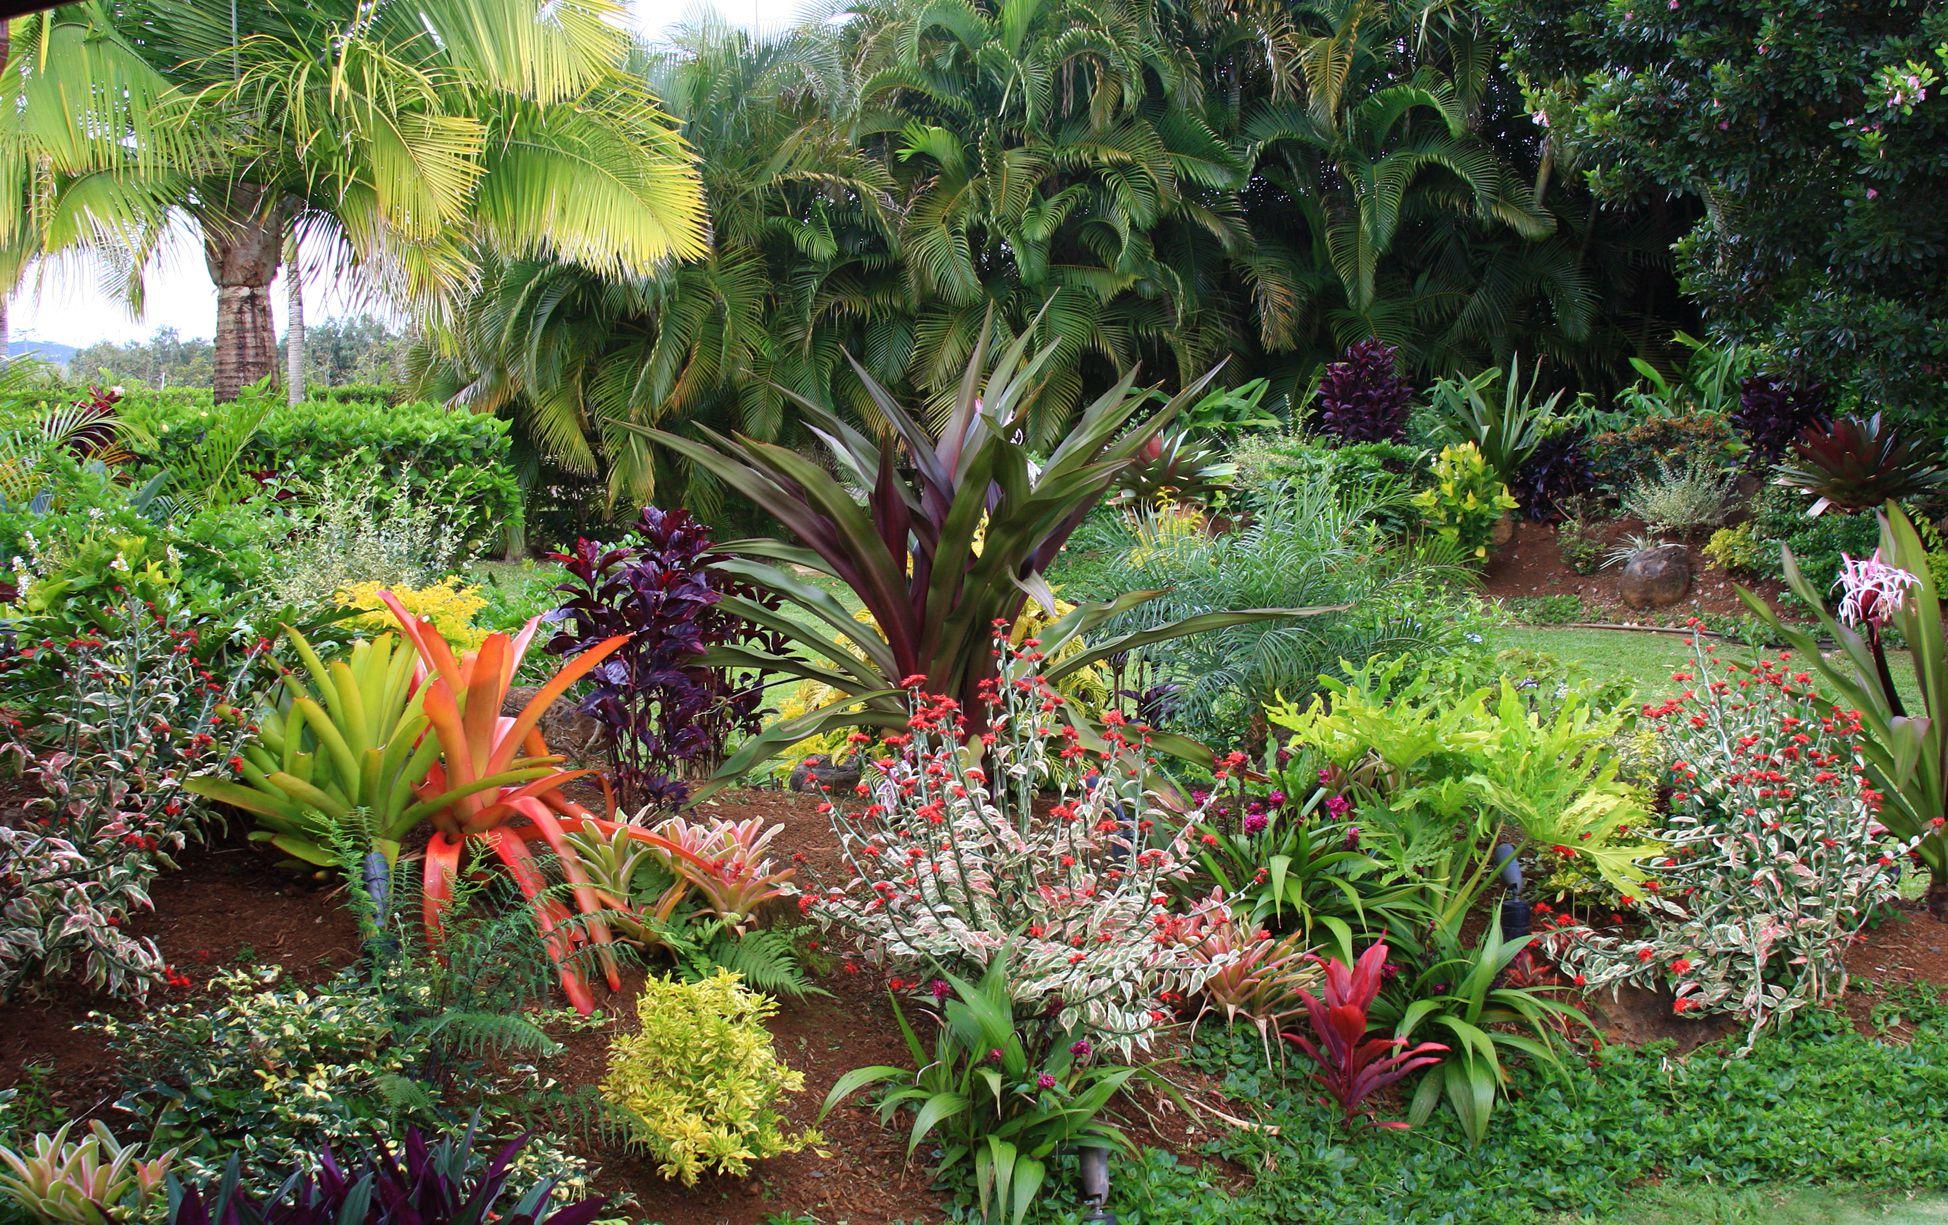 tropicalhawaiiangarden-58386cdd5f9b58d5b